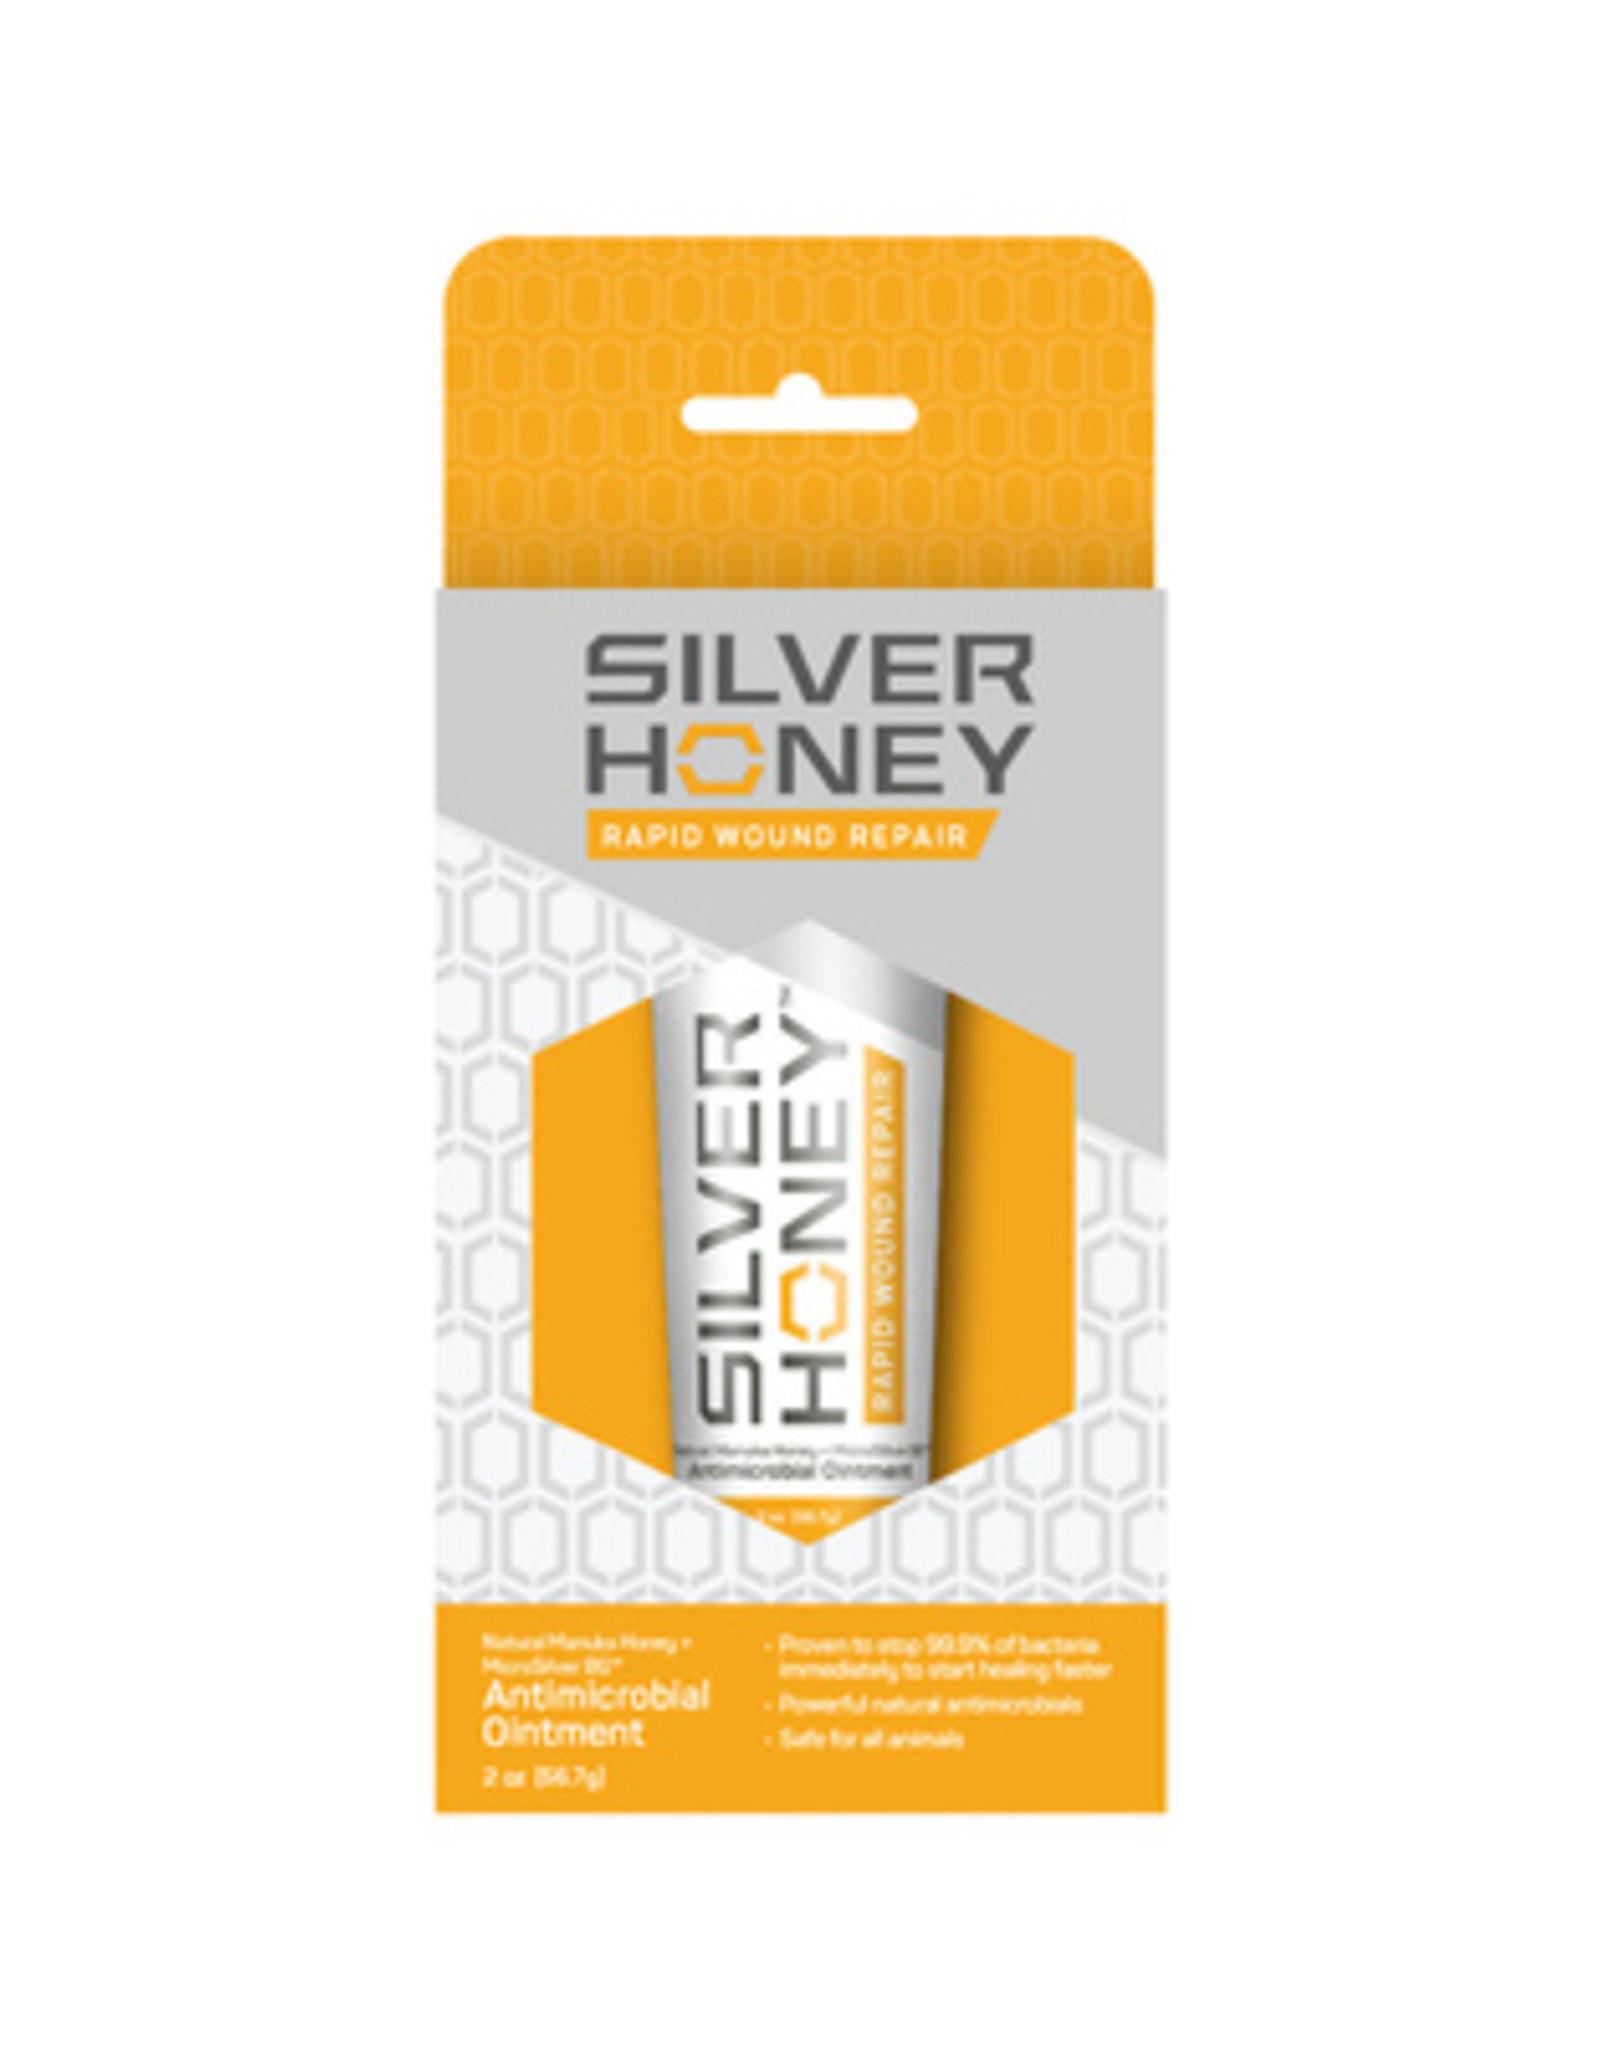 Silver Honey ointment 2 oz